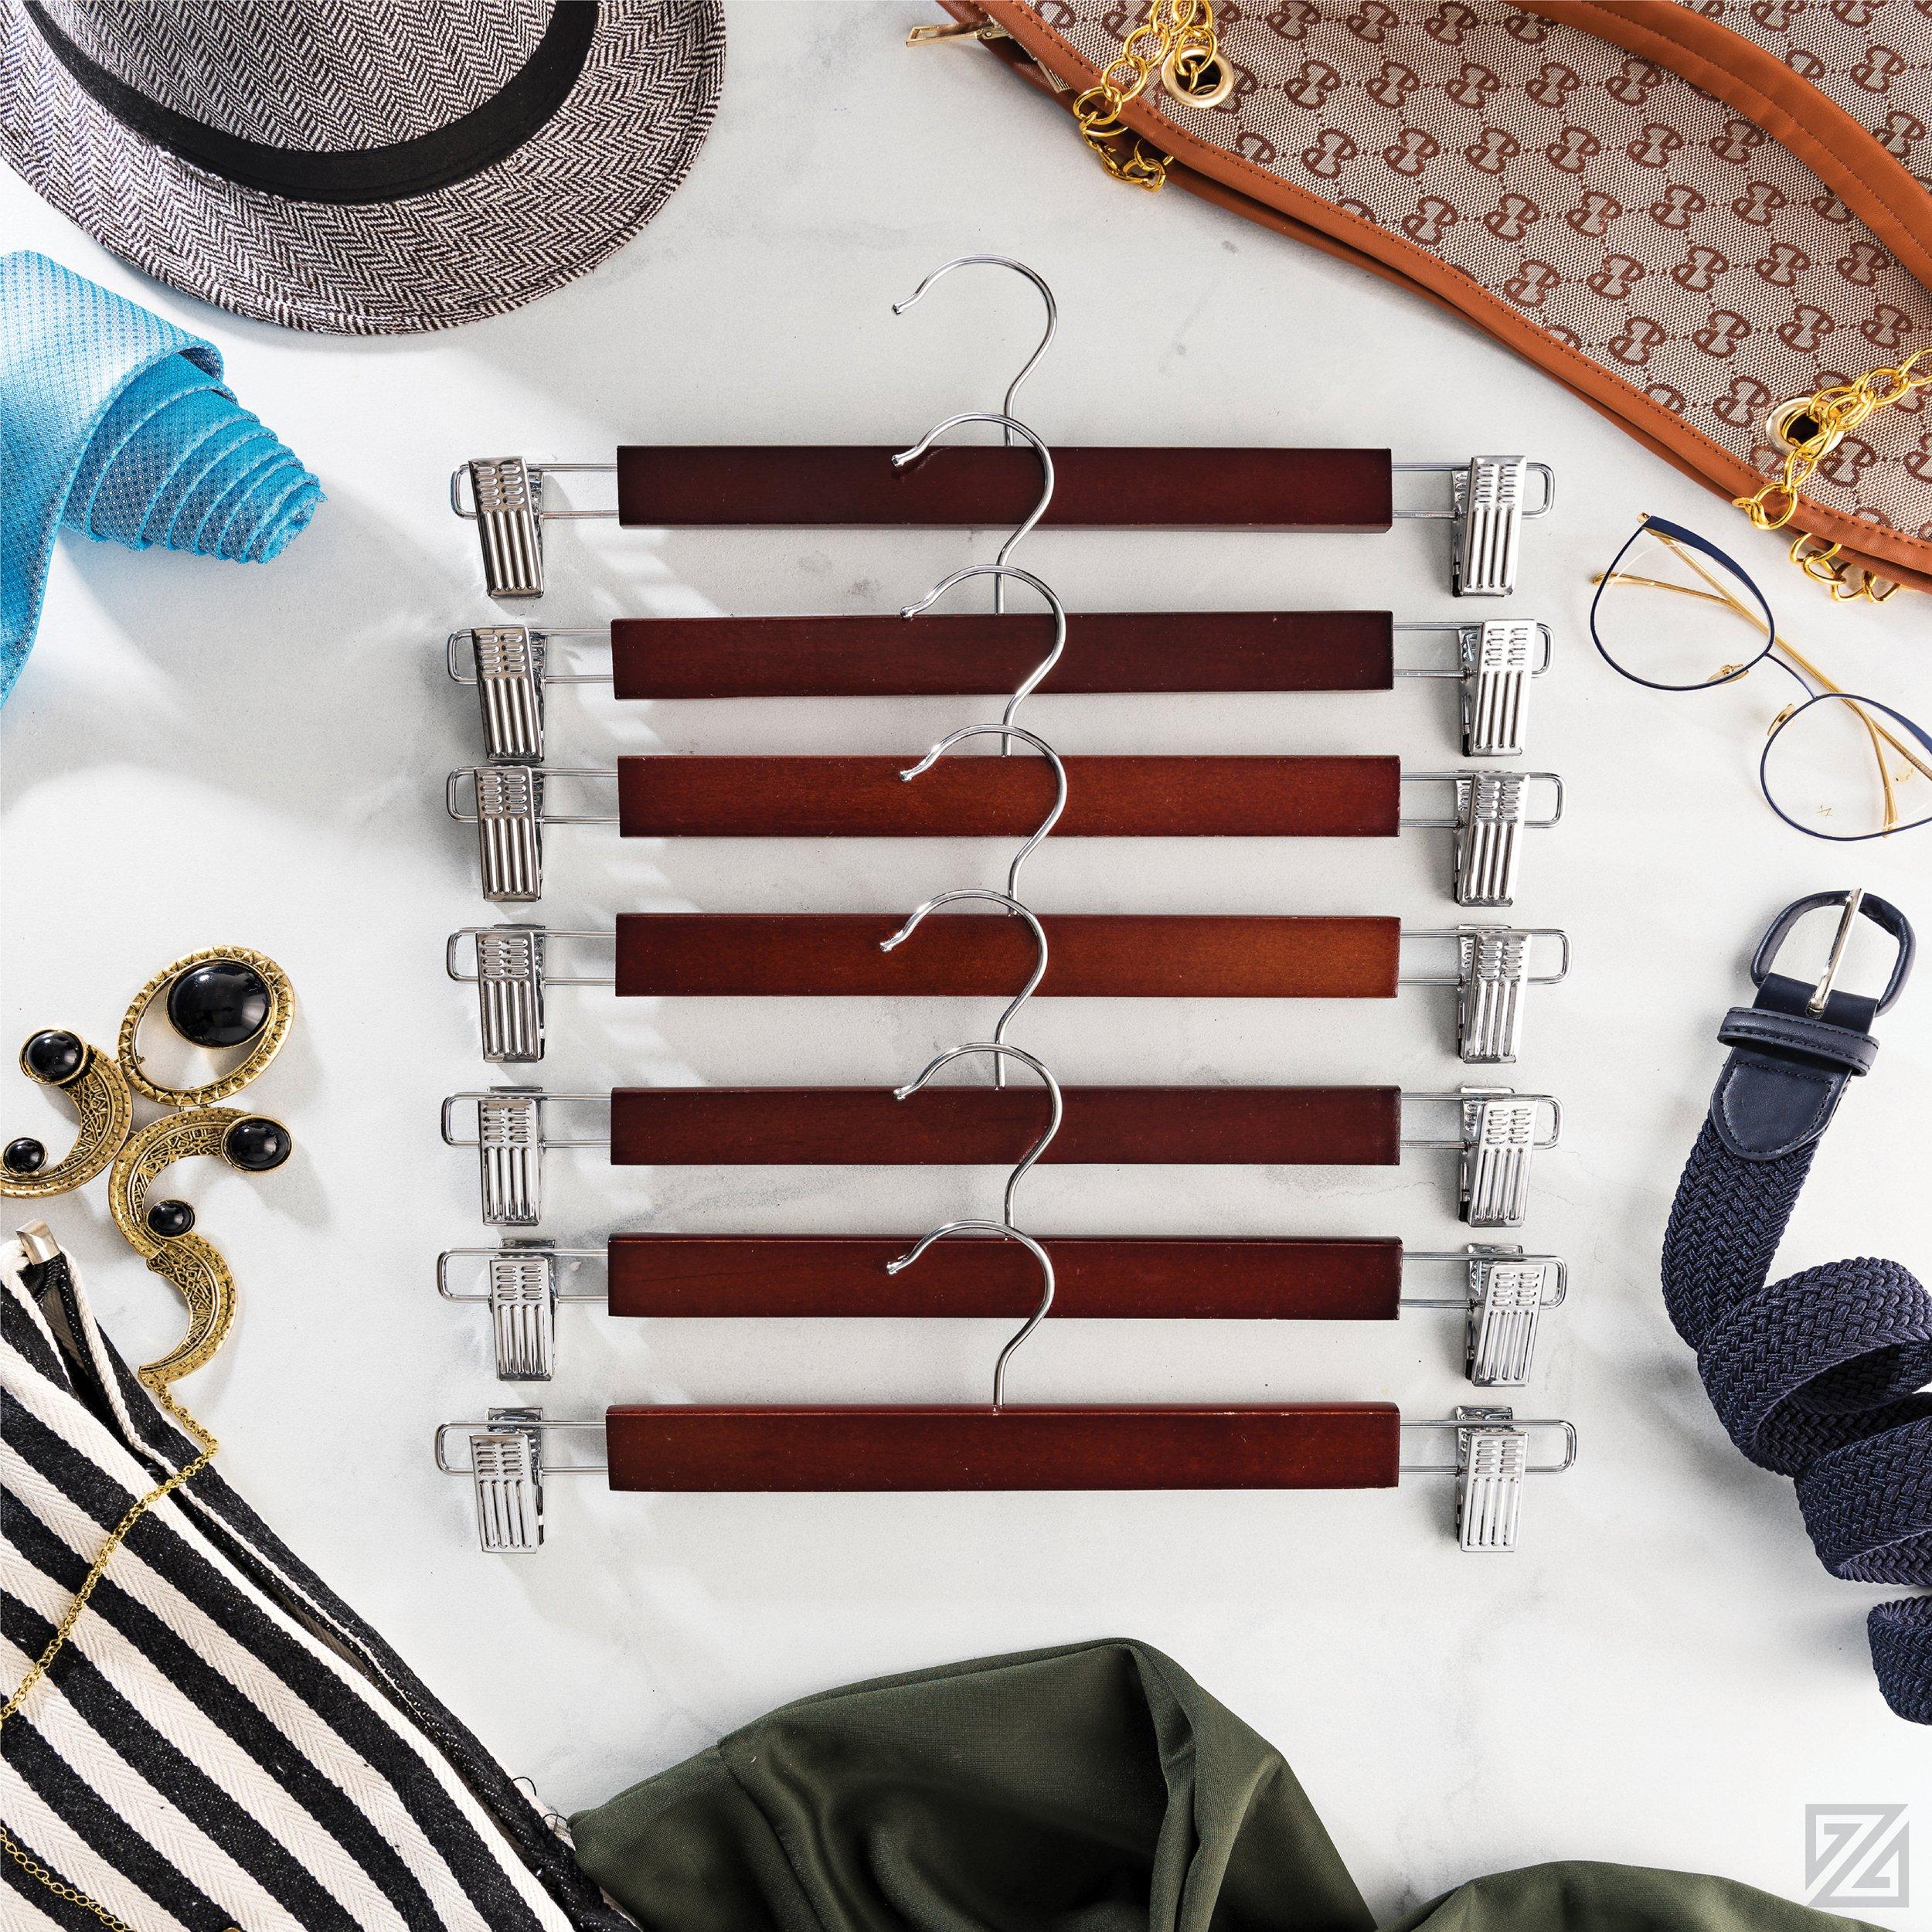 Zober Premium Wooden Skirt Hangers with Adjustable Clips (Pack of 10) Non-Slip Trouser Hanger Cherry Lotus Wood Pants hangers, 360 Degree Swivel Hook, for Skirts, Jeans, Slacks, Pants, 13'' Wide by ZOBER (Image #6)